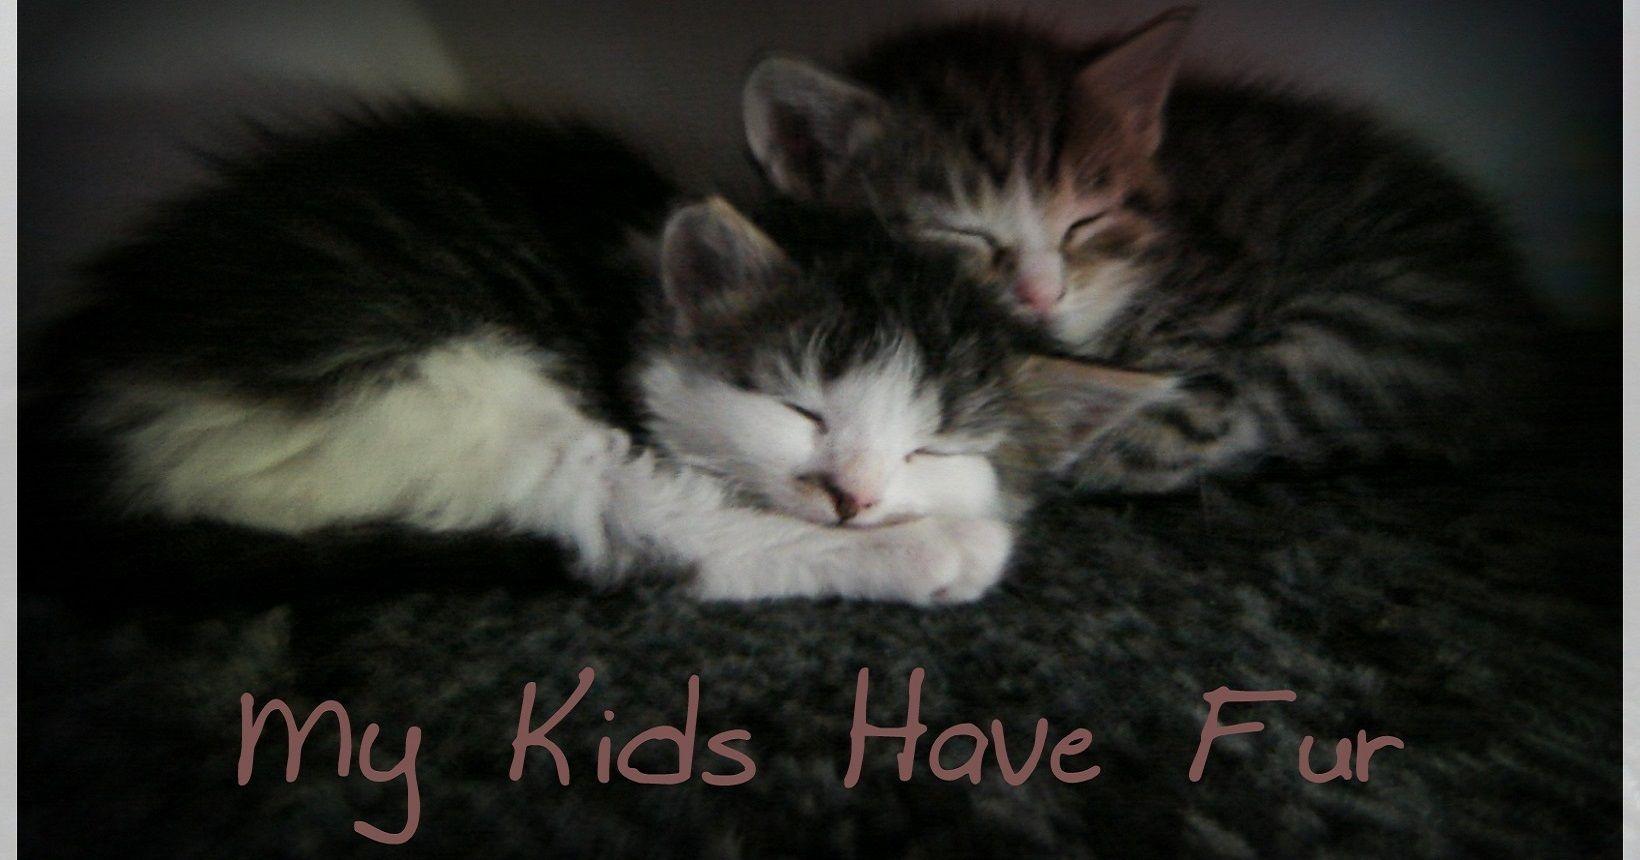 Google themes meme - Furkids Tabby Feline Furkids Cats Feline Kittens Cats Friends Adorable Adorable Furry Babies Nap Furry Babies Theme Kittens